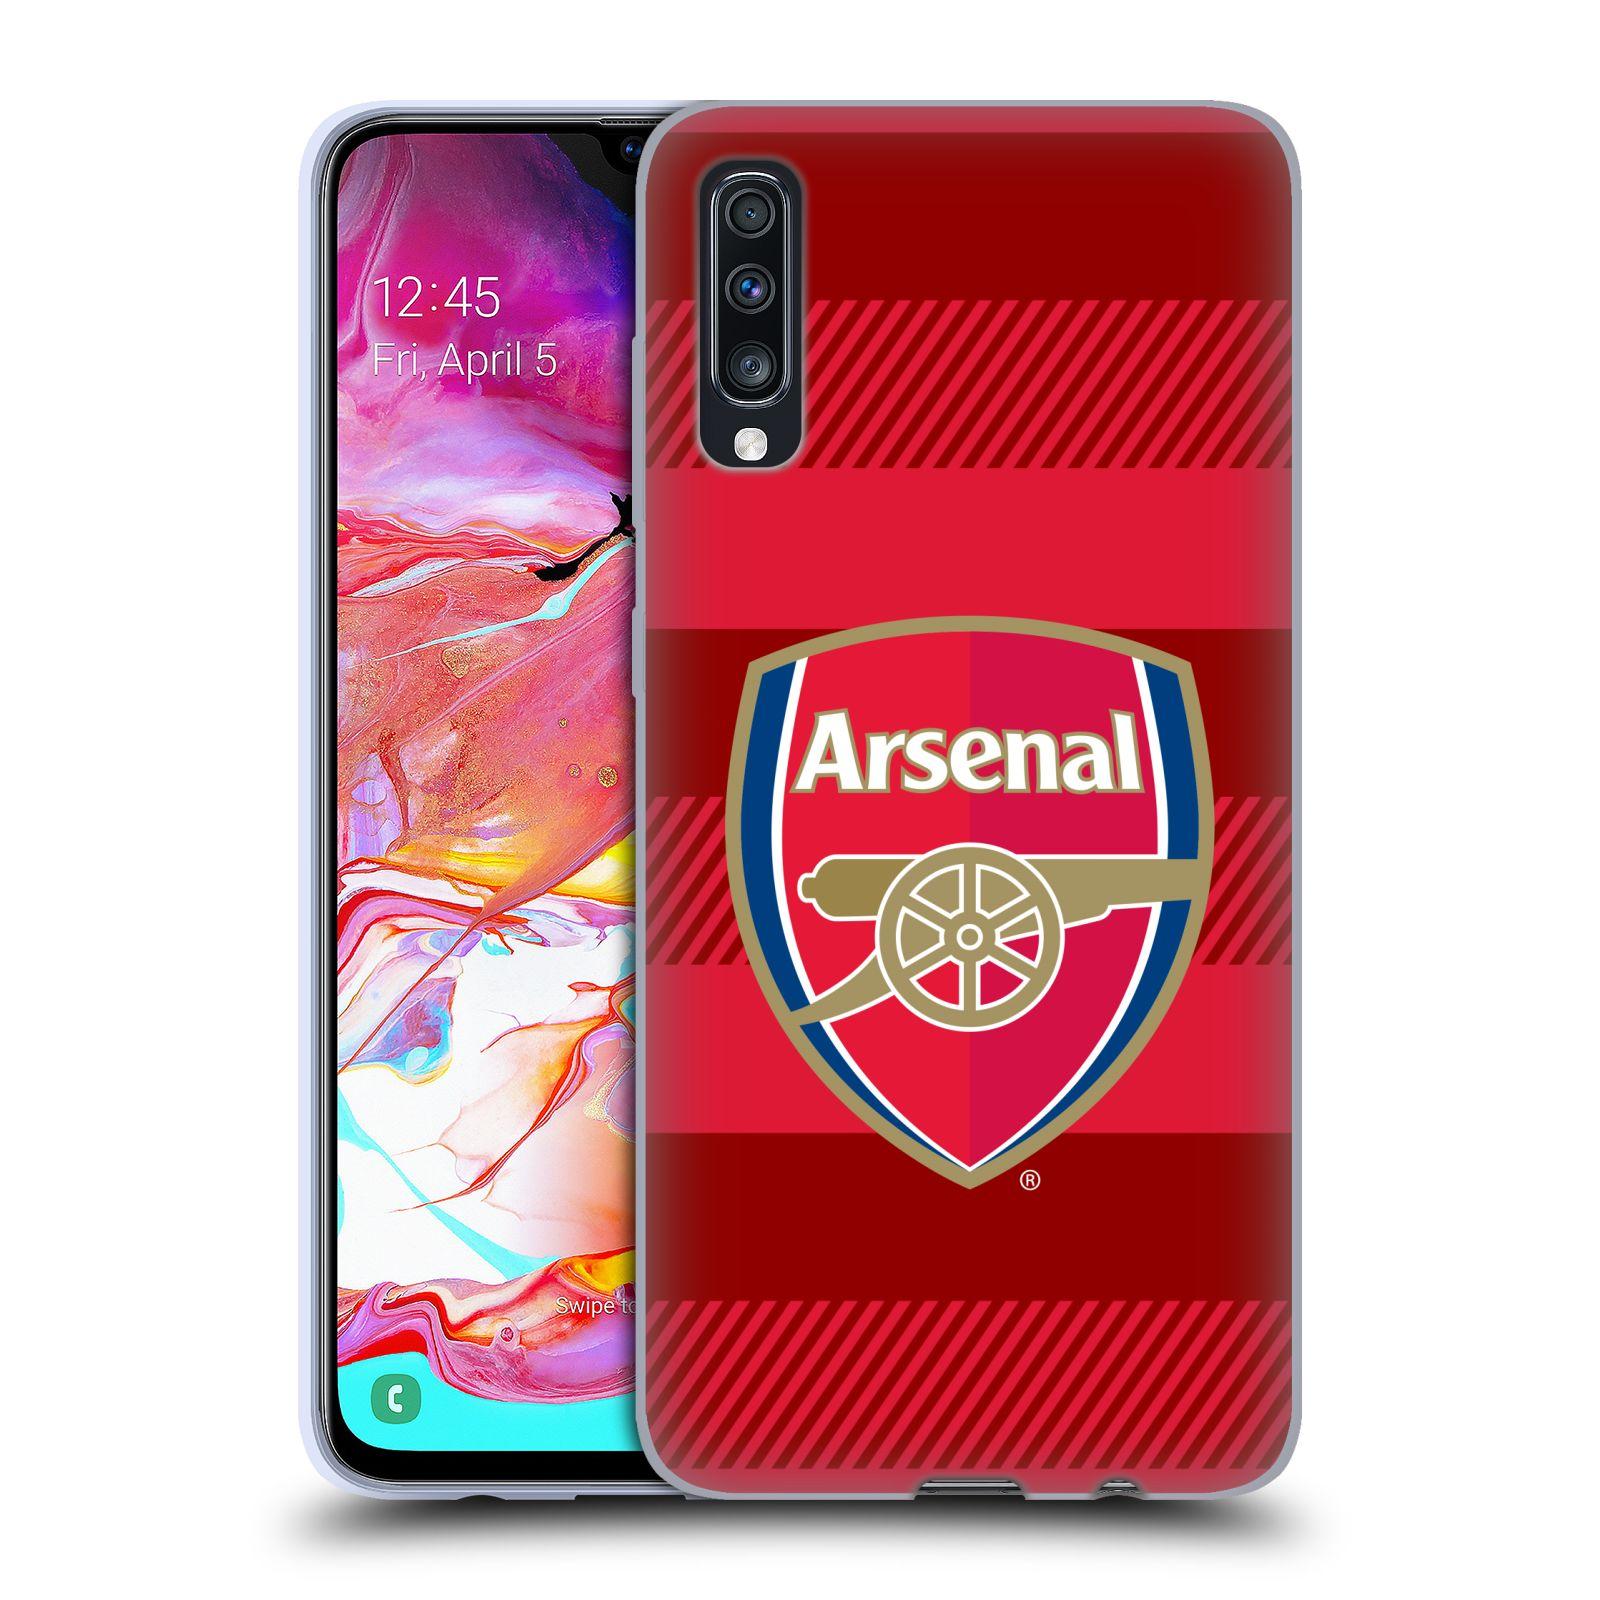 Silikonové pouzdro na mobil Samsung Galaxy A70 - Head Case - Arsenal FC - Logo s pruhy